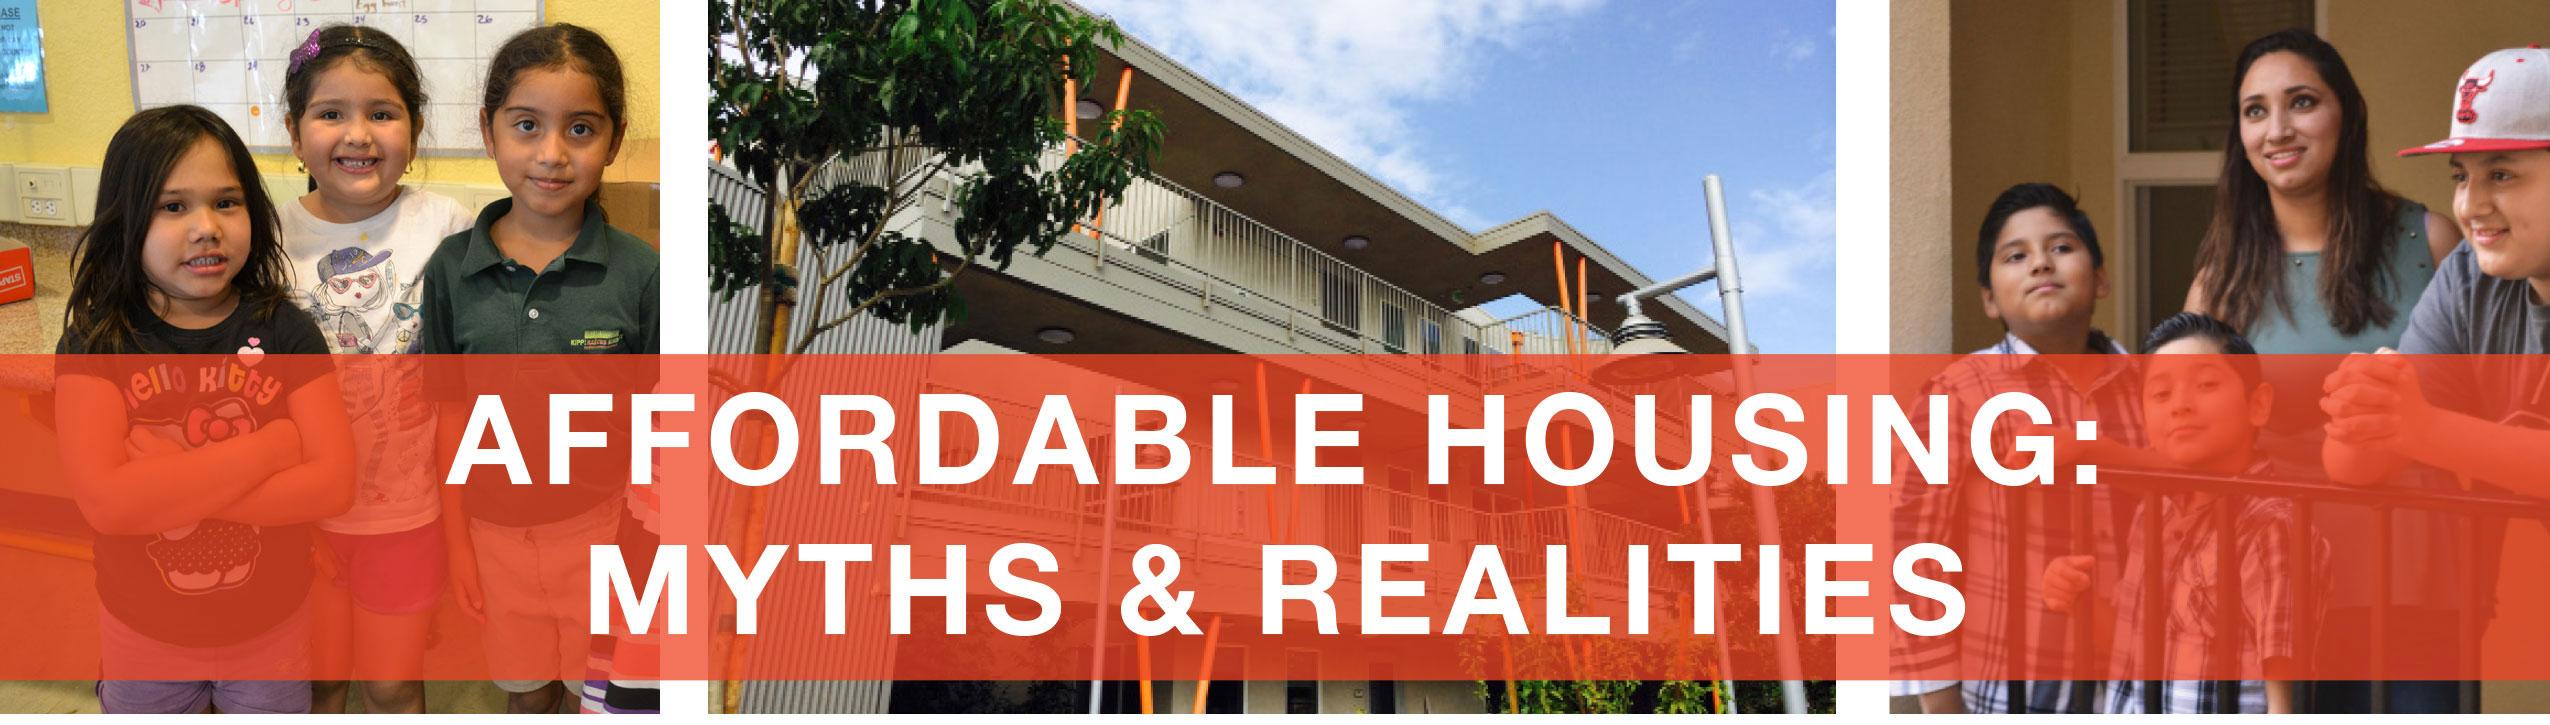 2016_BANNER_affordable-housing-myths-sheet.jpg